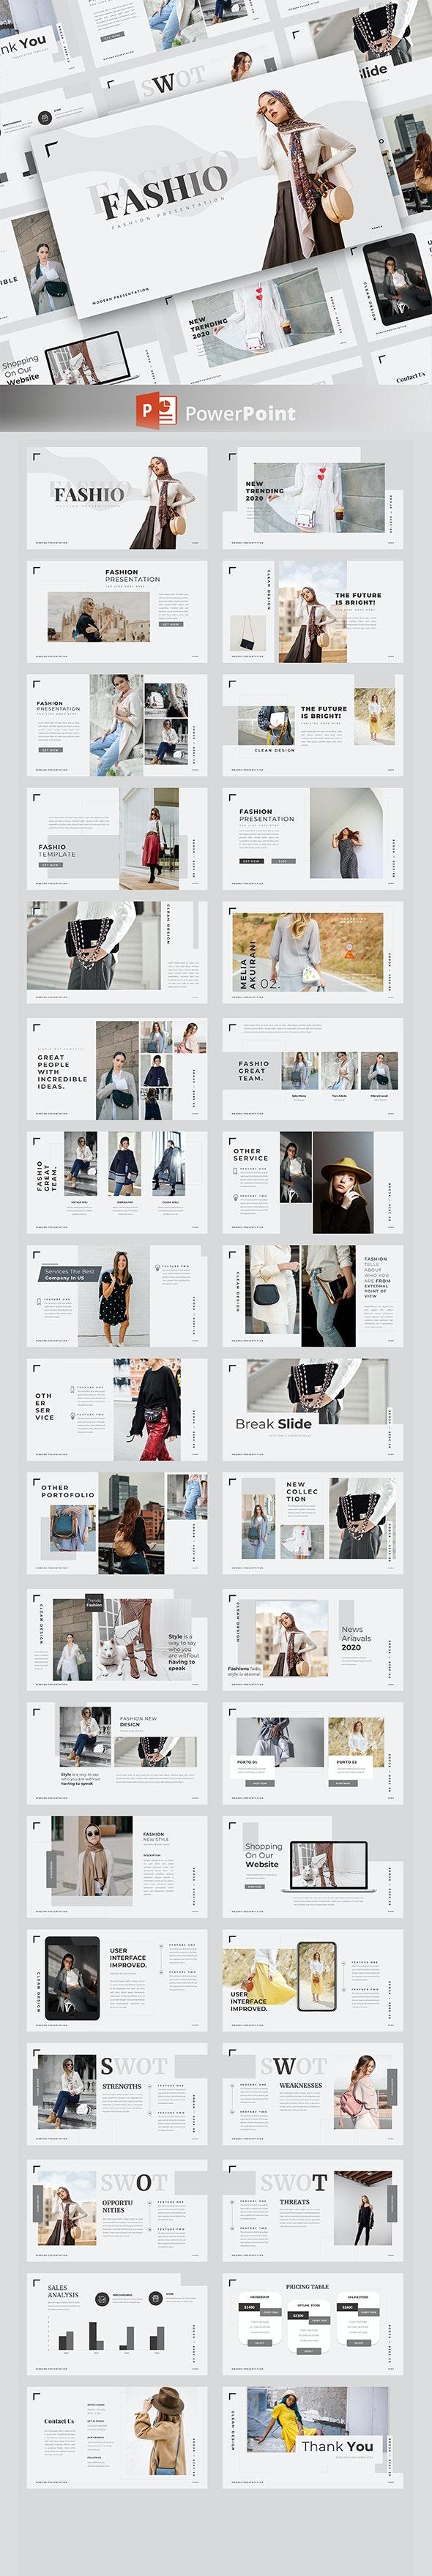 Fashio – Creative Business PowerPoint Template - Creative PowerPoint Templates